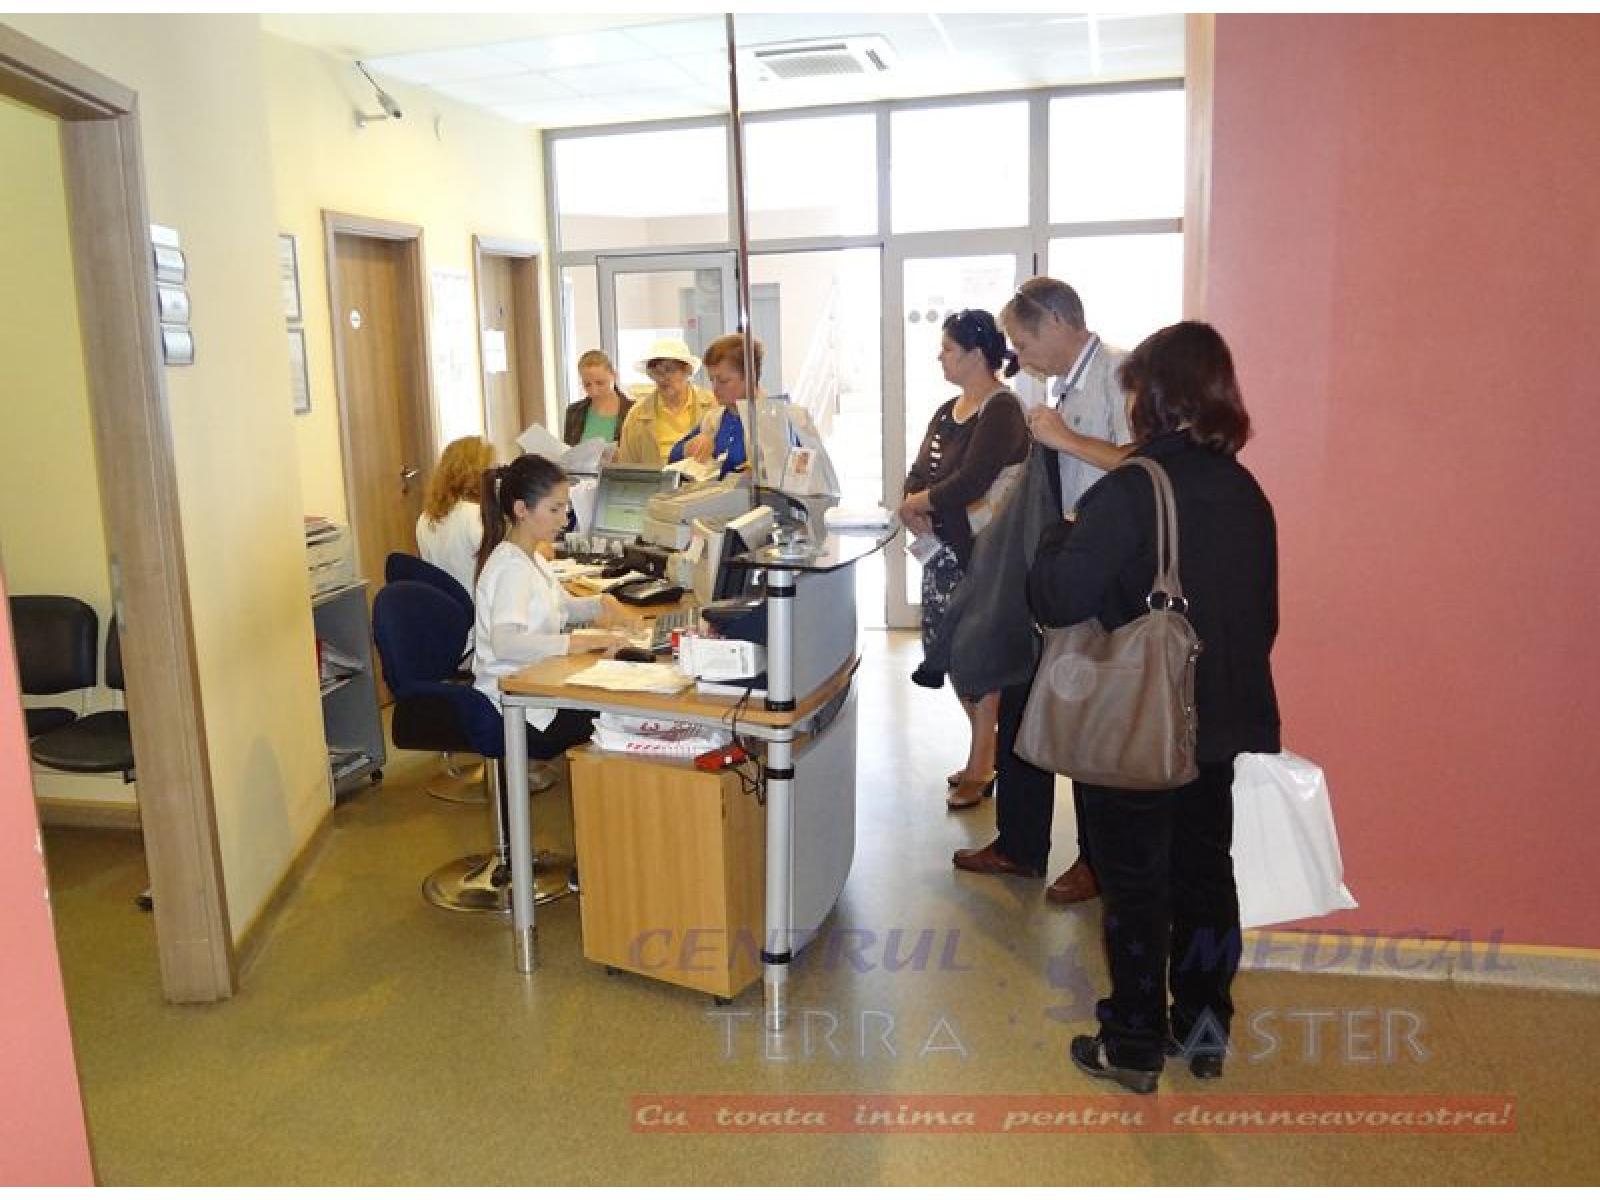 Centrul Medical TERRA ASTER - DSC03314.JPG